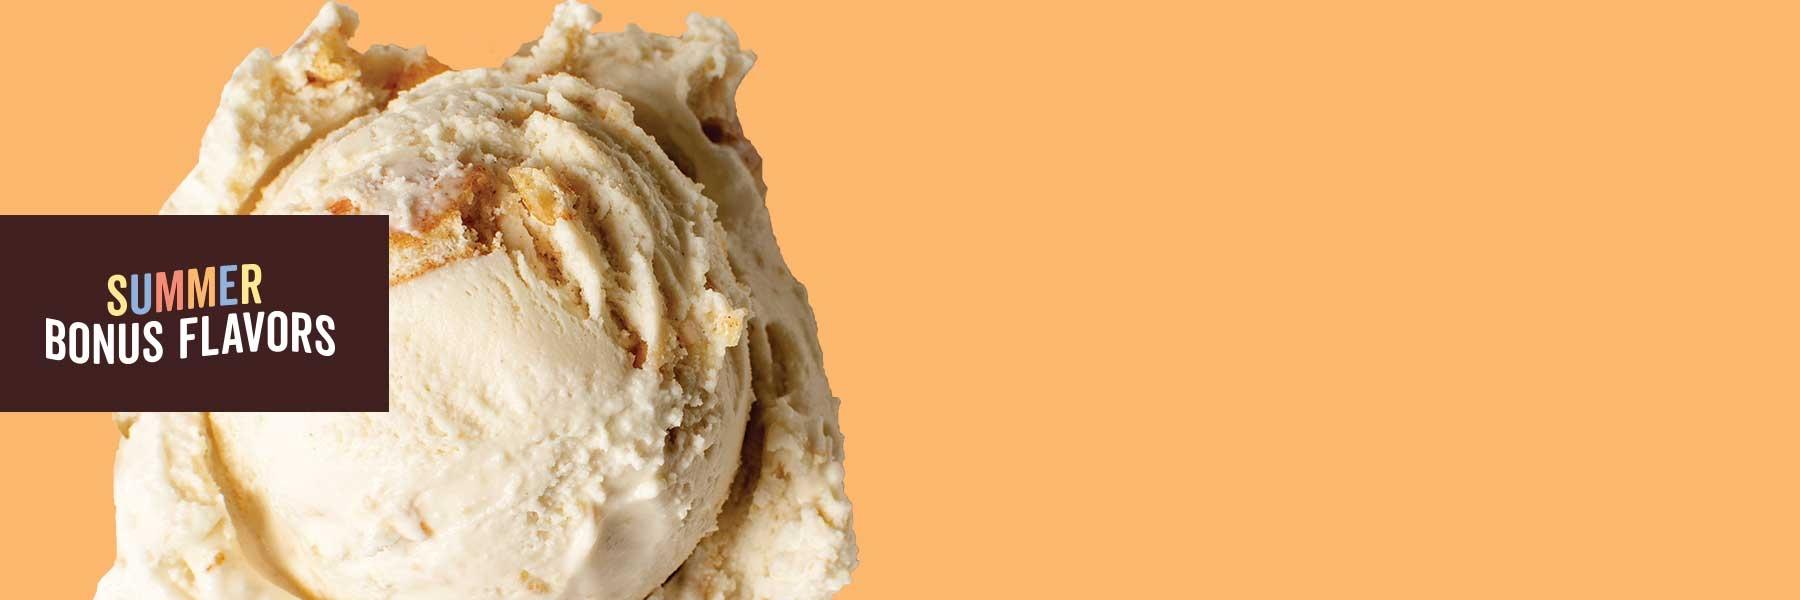 Maple Cinnamon Crunch Ice Cream